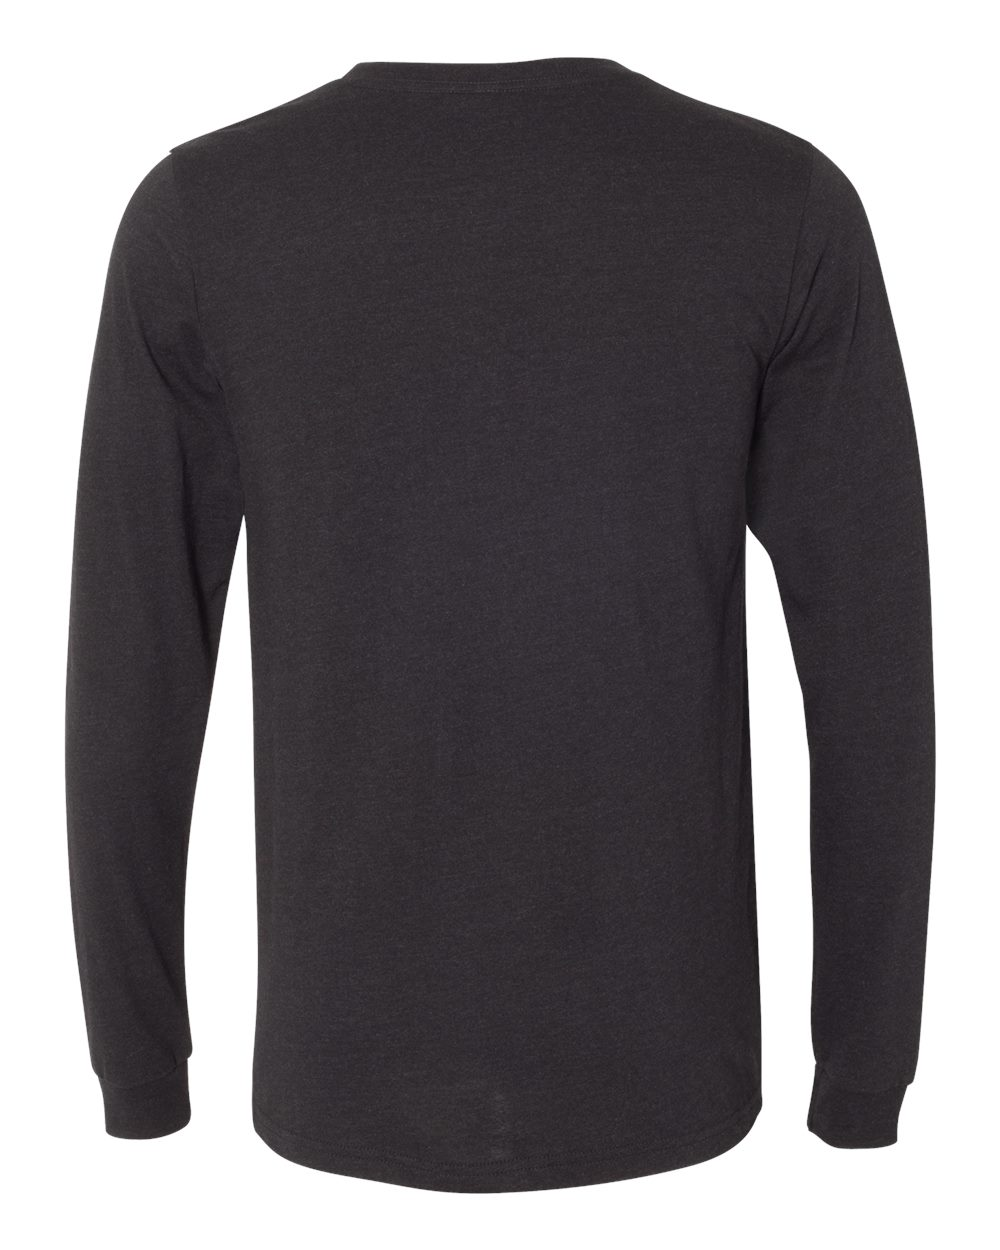 Bella-Canvas-Mens-Blank-Top-Long-Sleeve-Jersey-Tee-T-Shirt-3501-up-to-3XL thumbnail 22